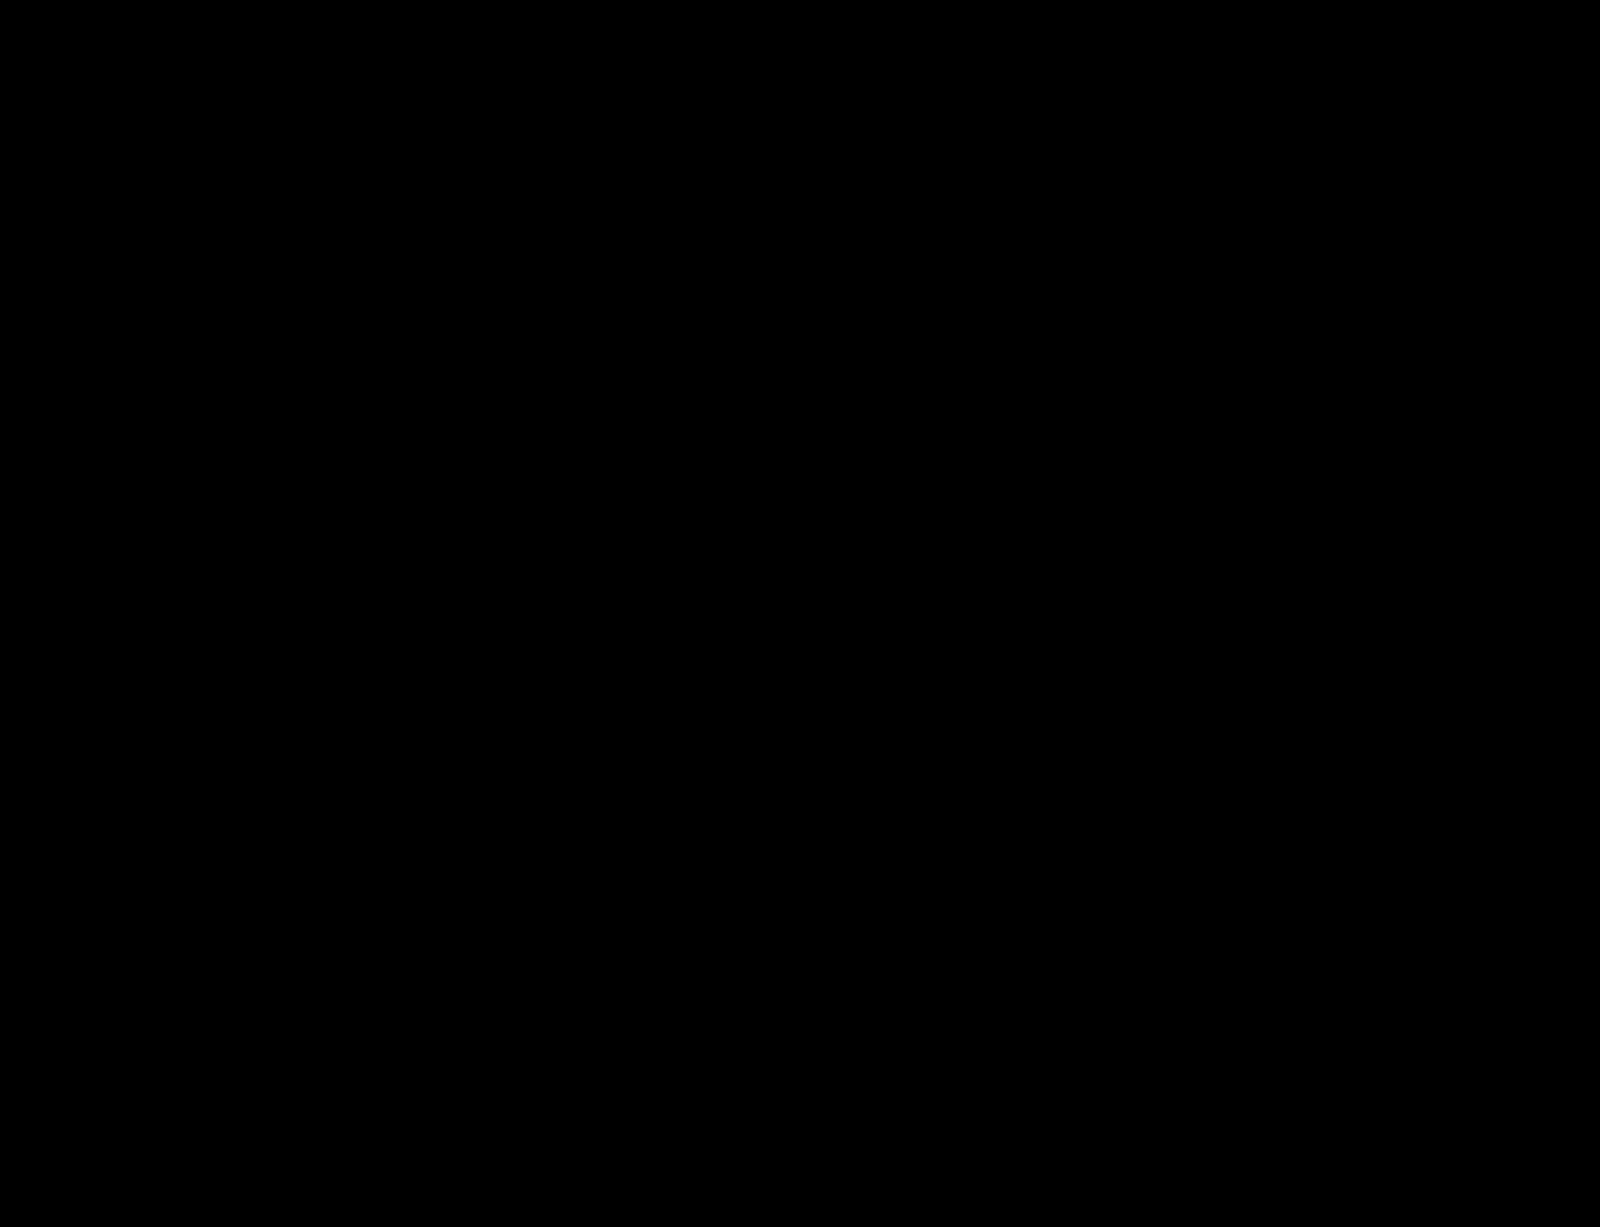 11kv control panel ledningsdiagram